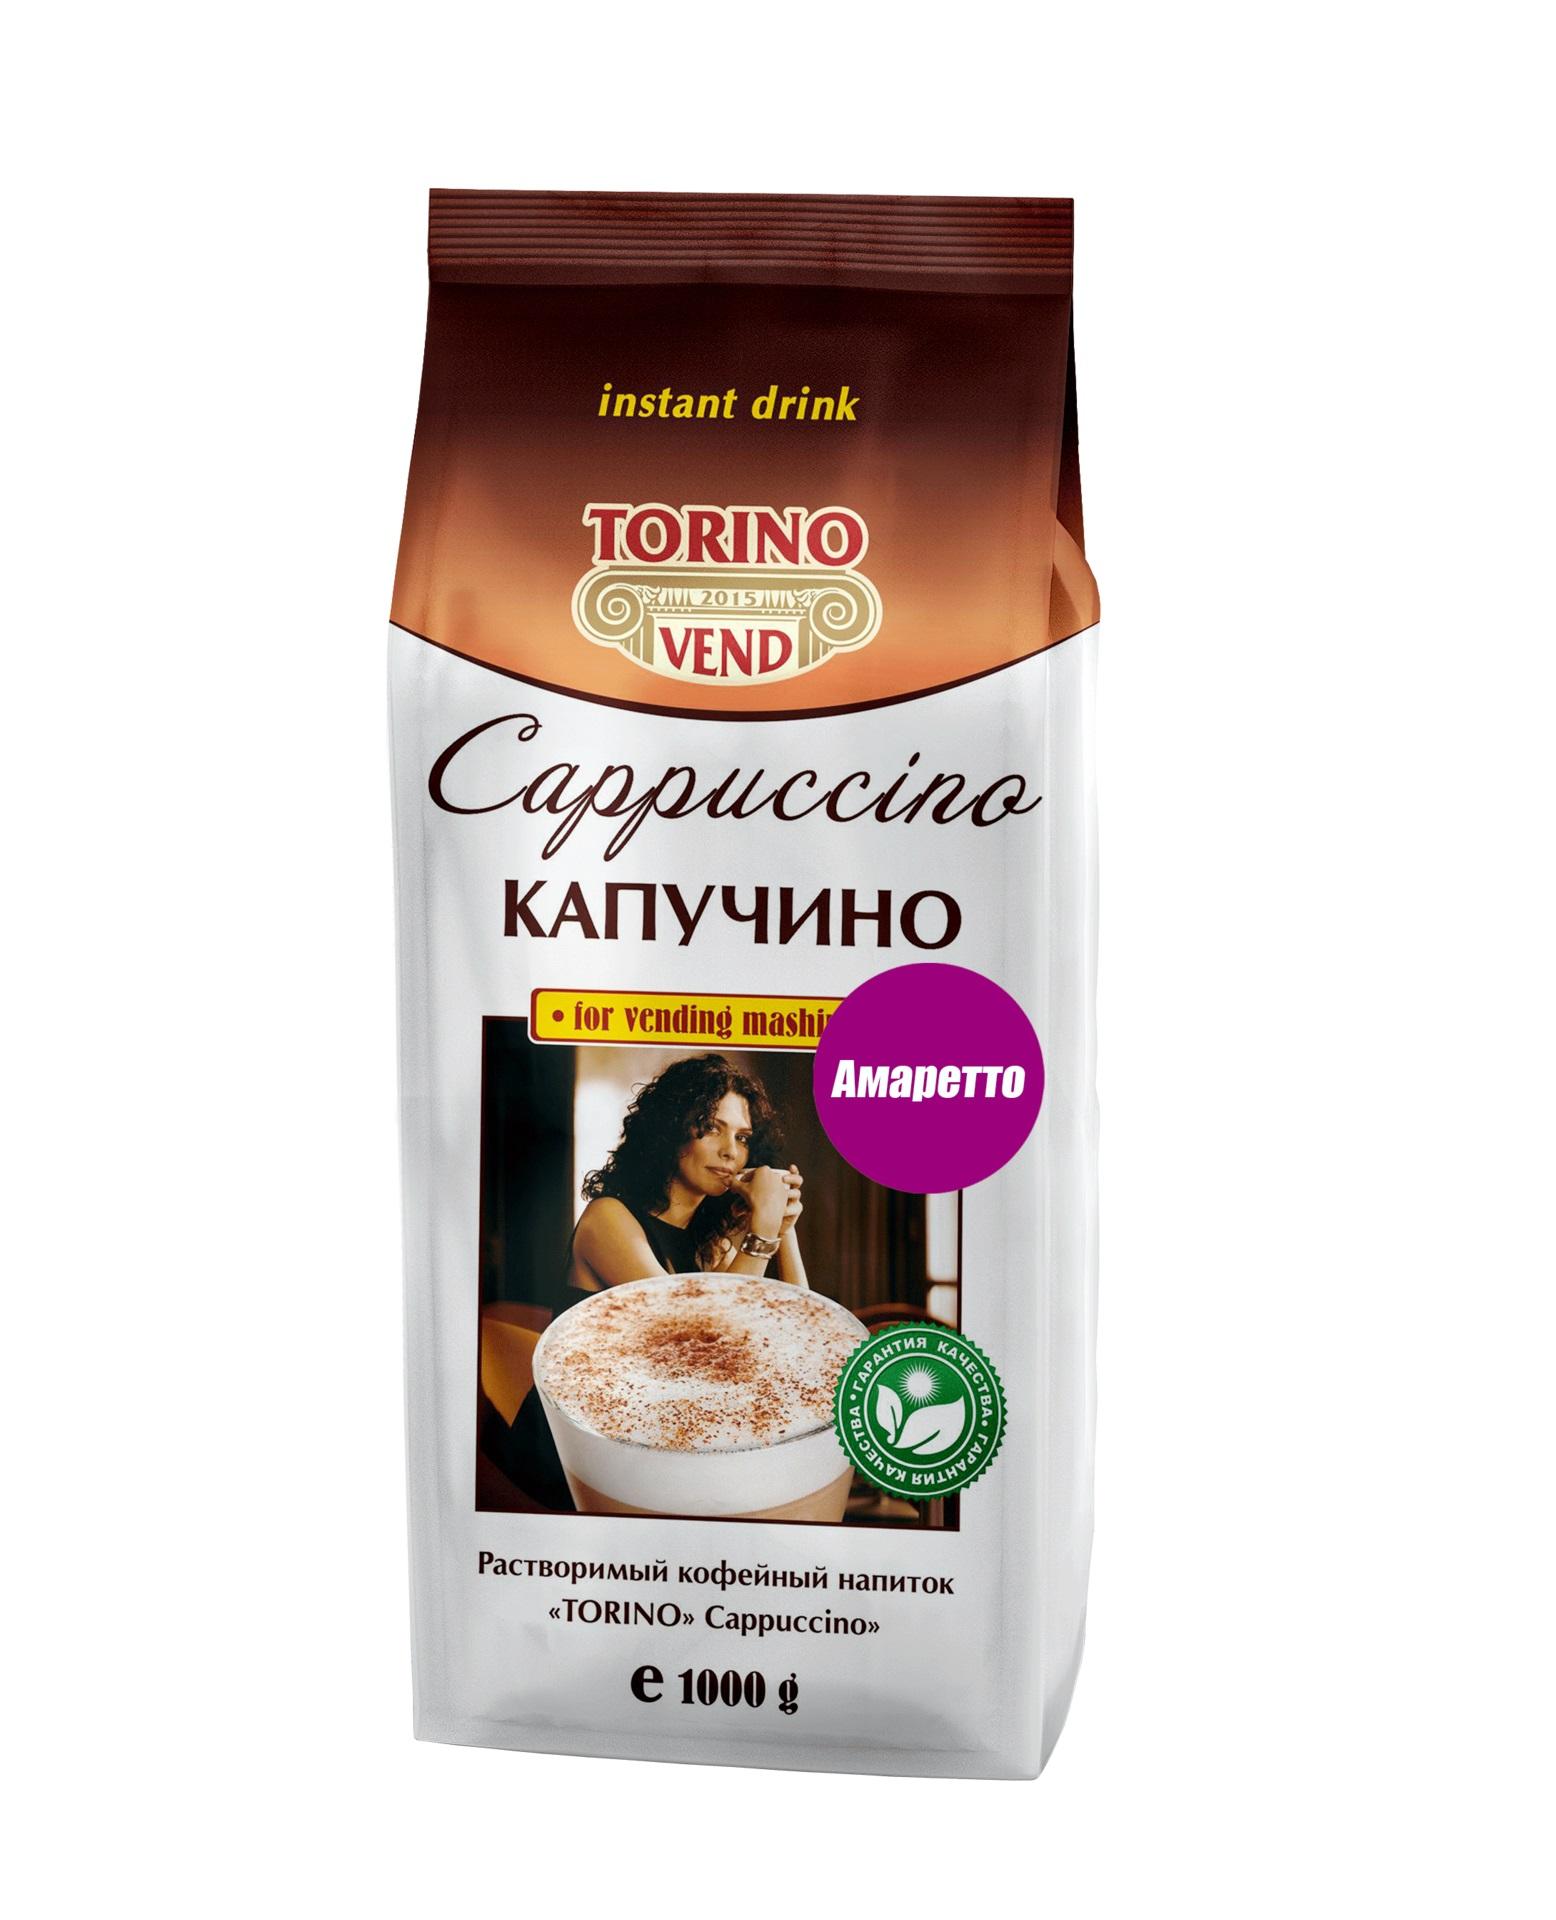 Кофейный напиток TORINO Капучино Амаретто 1,0 кг.